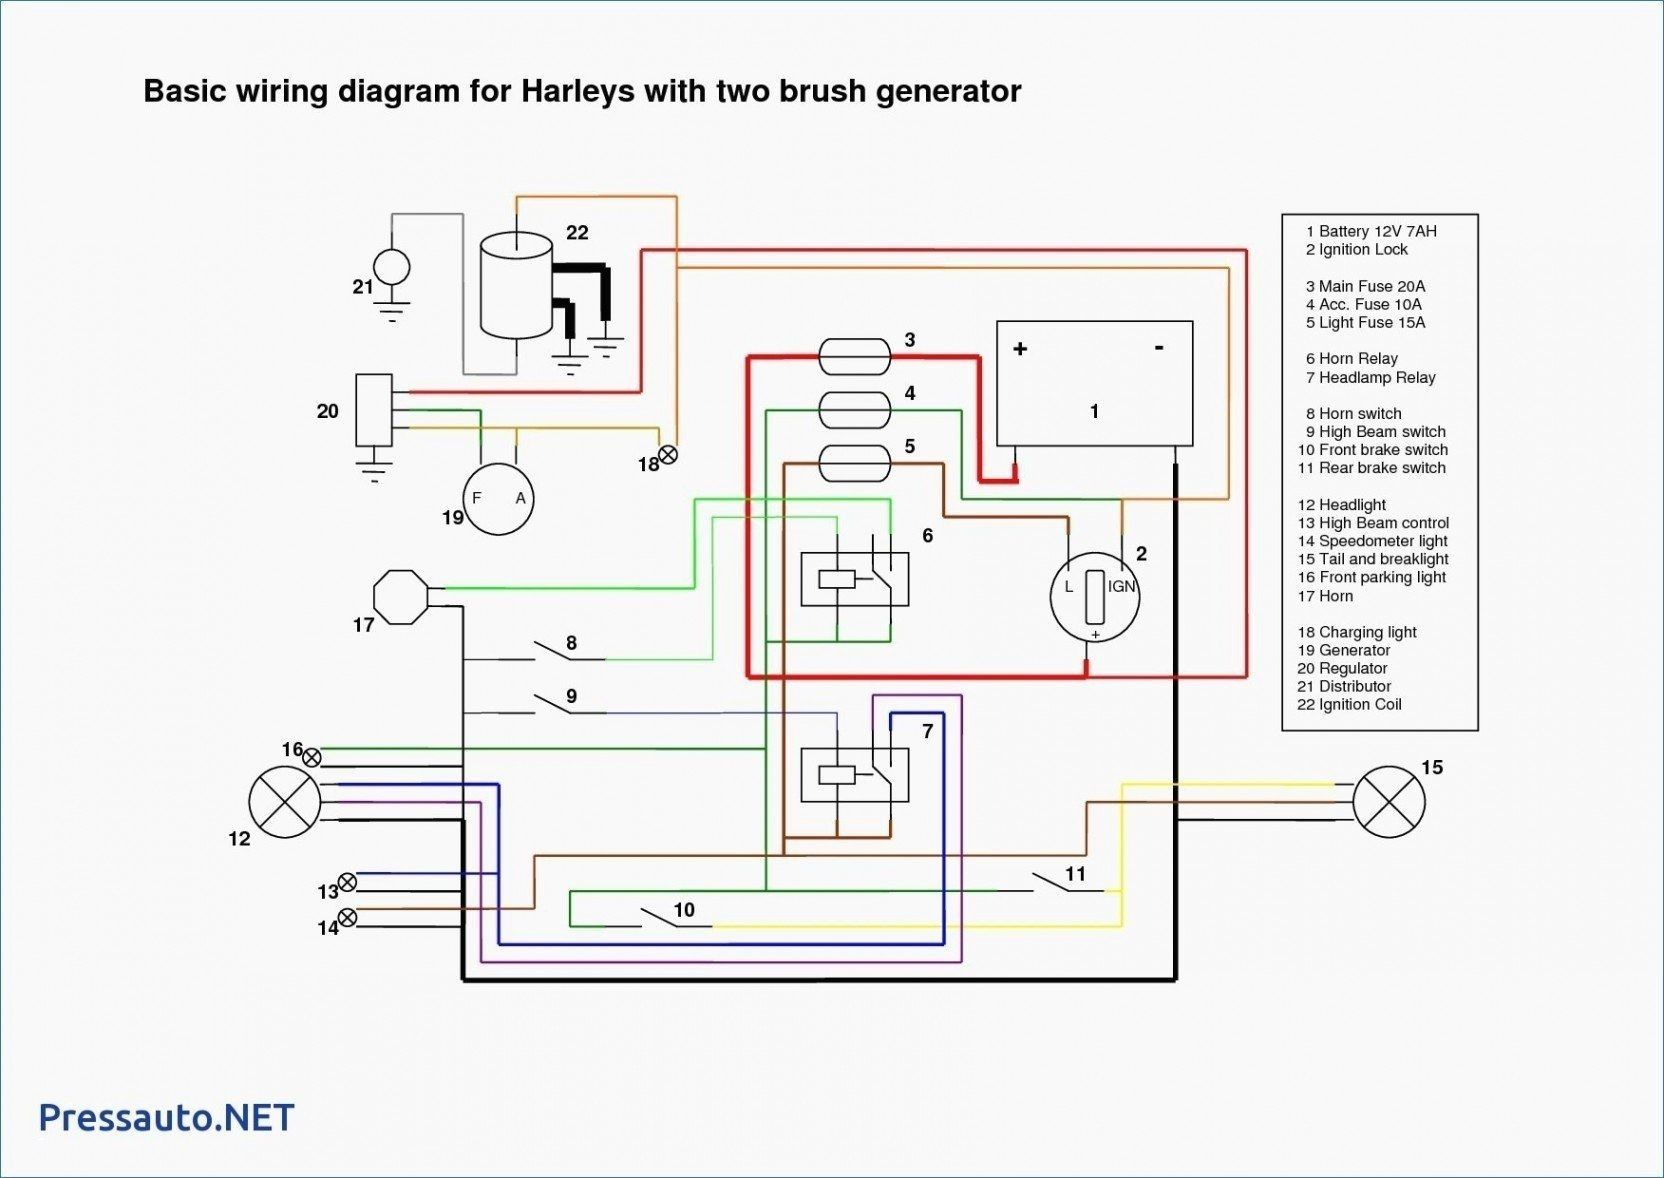 ford e 150 starter switch wiring for pinterest blog wiring diagram ford e 150 starter switch wiring for pinterest [ 1664 x 1178 Pixel ]